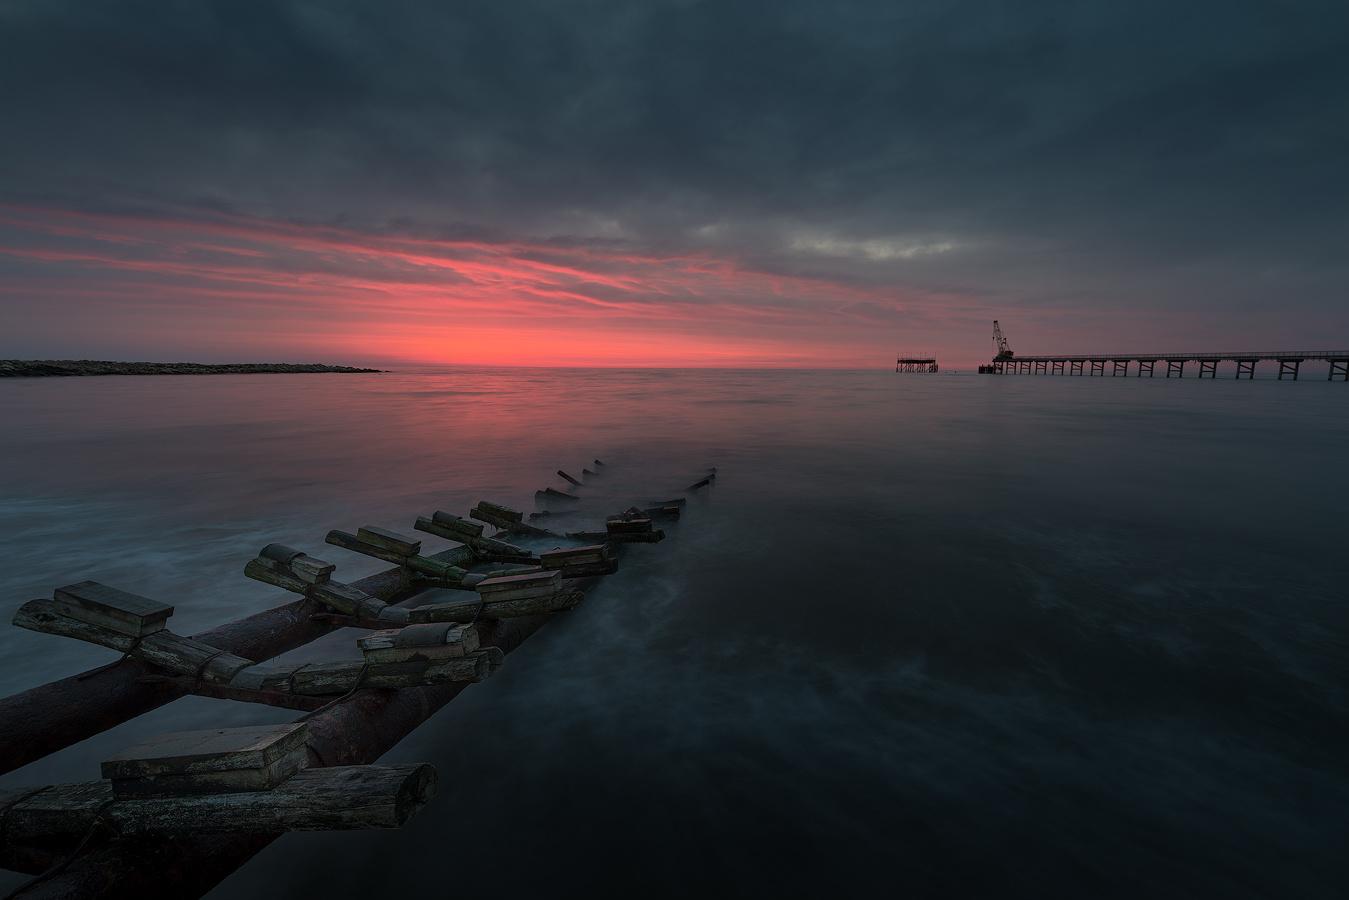 Burning skies by Ivo Kuzov